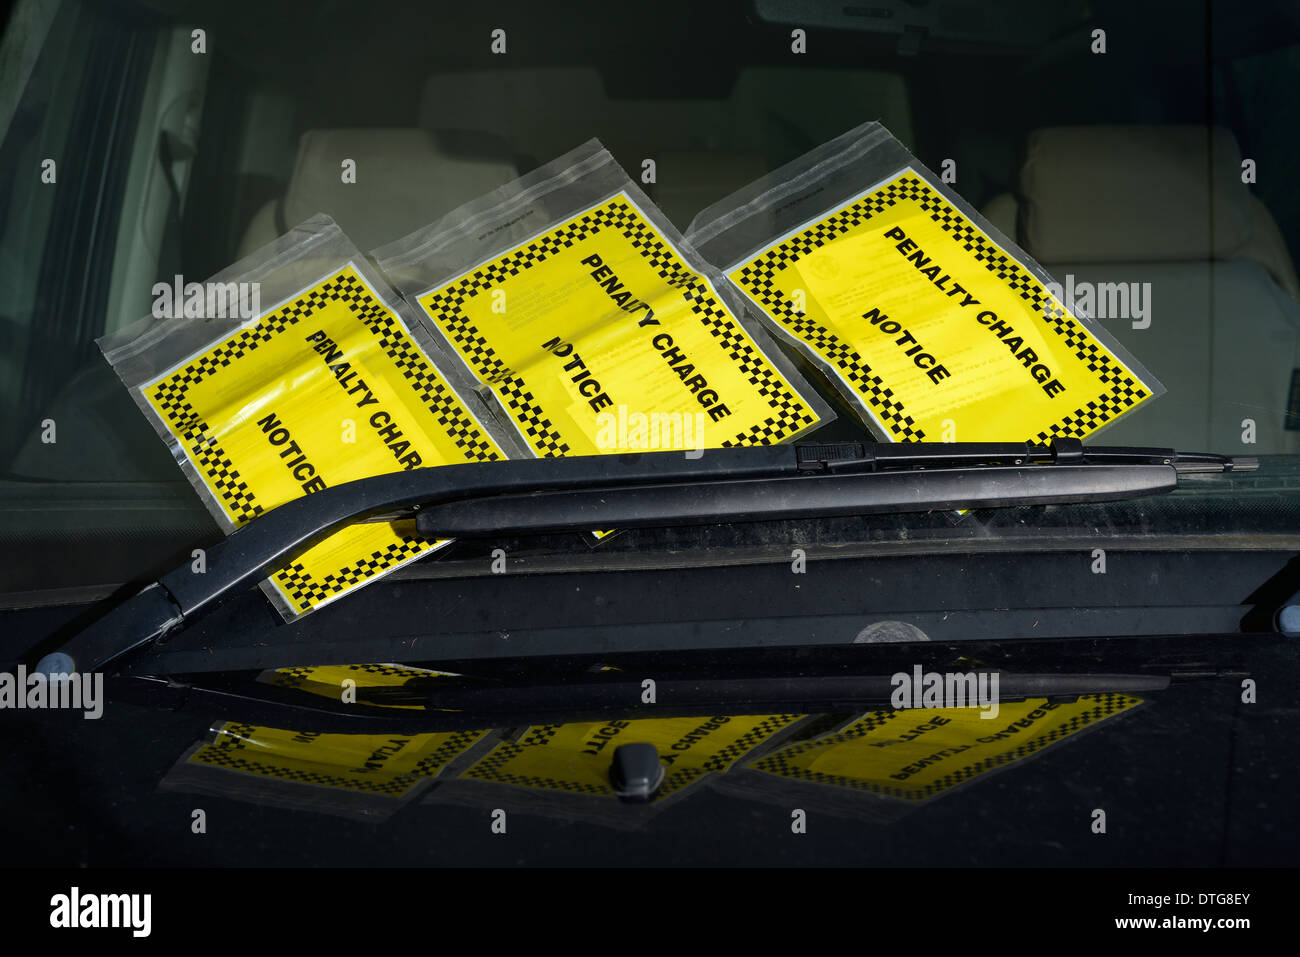 Three parking tickets on car window. - Stock Image